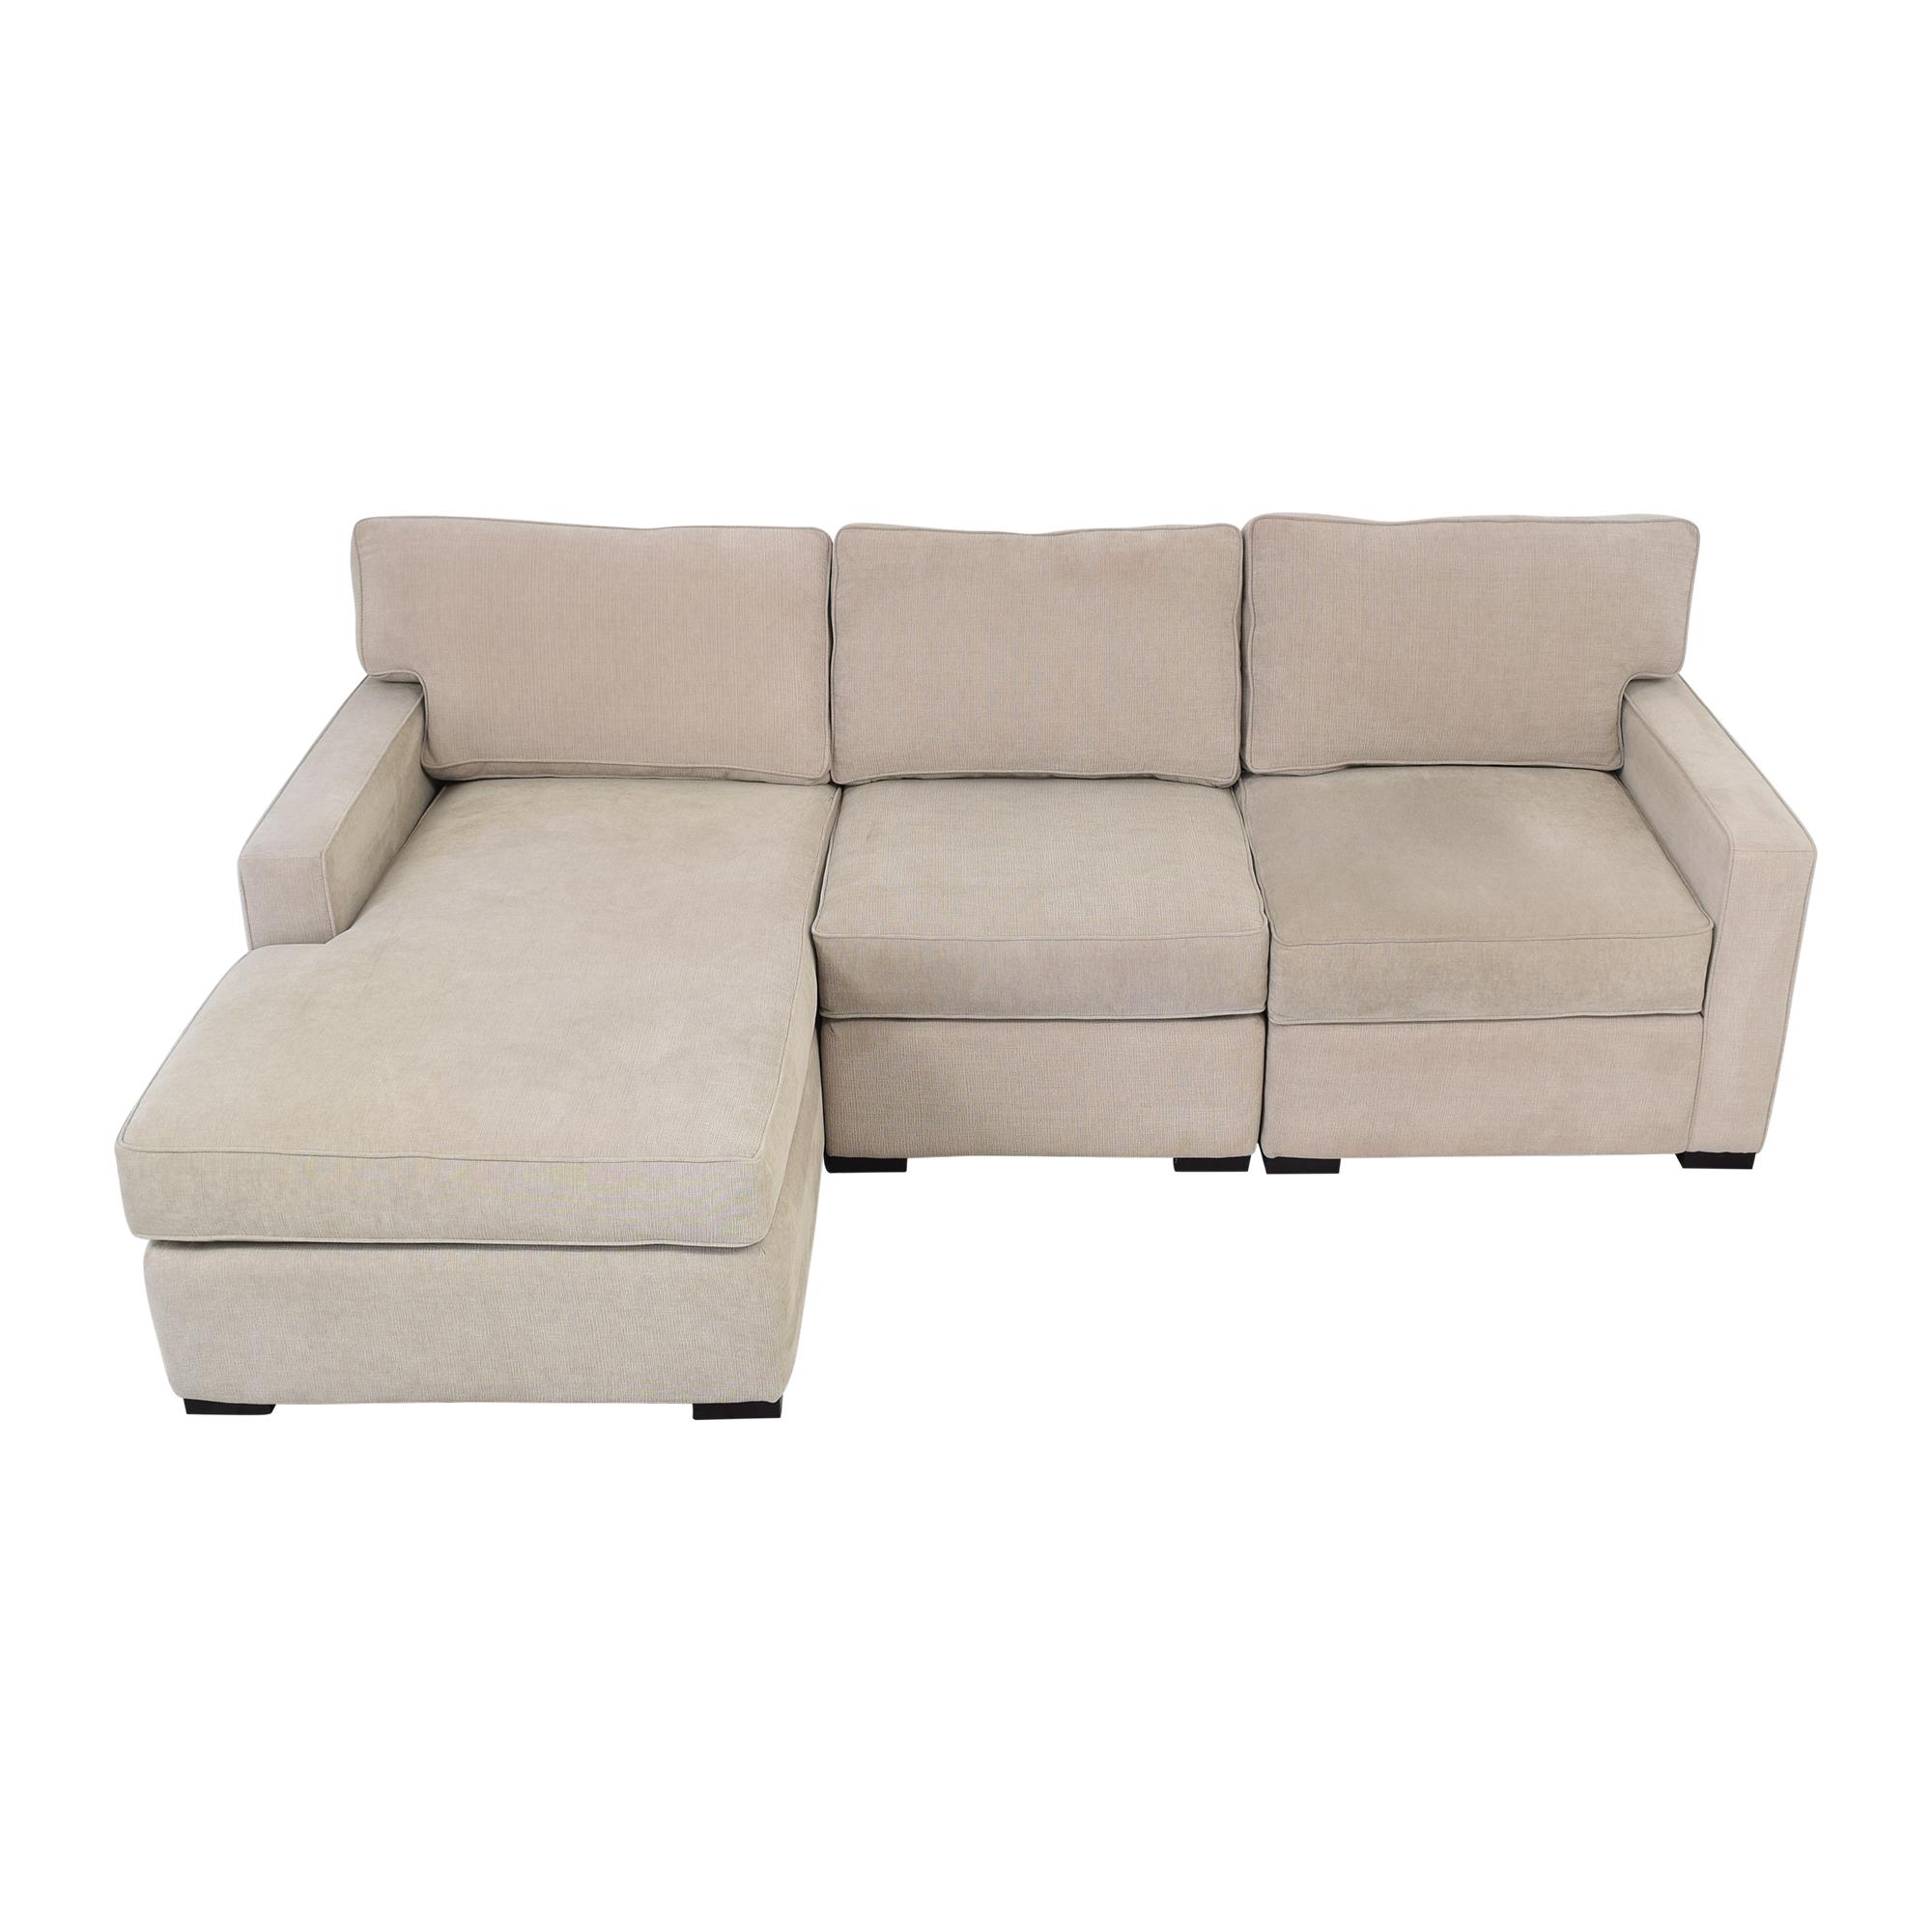 Macy's Macy's Chaise Sectional Sofa ma